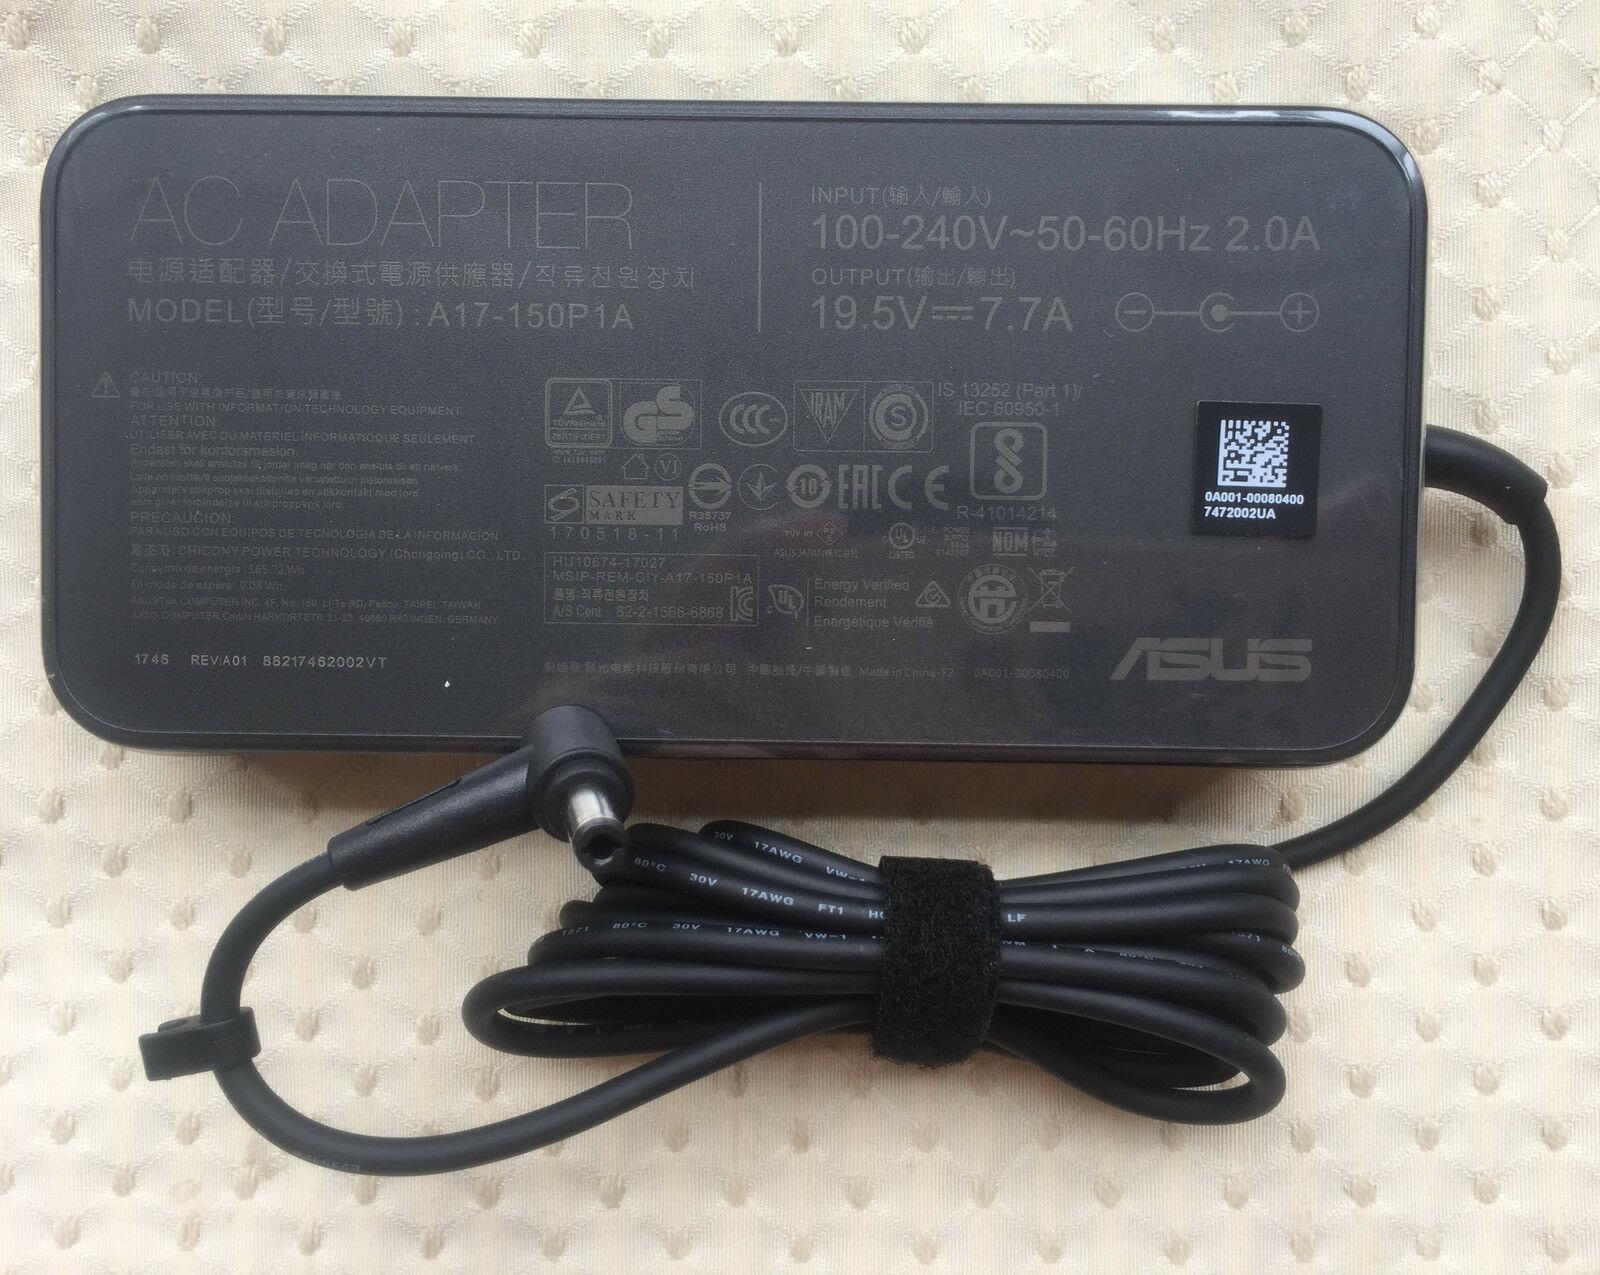 ASUS ADAPTER 150W 19.5v-7.7A 3P(5.5PHI) A17-150P1A for ROG & TUF